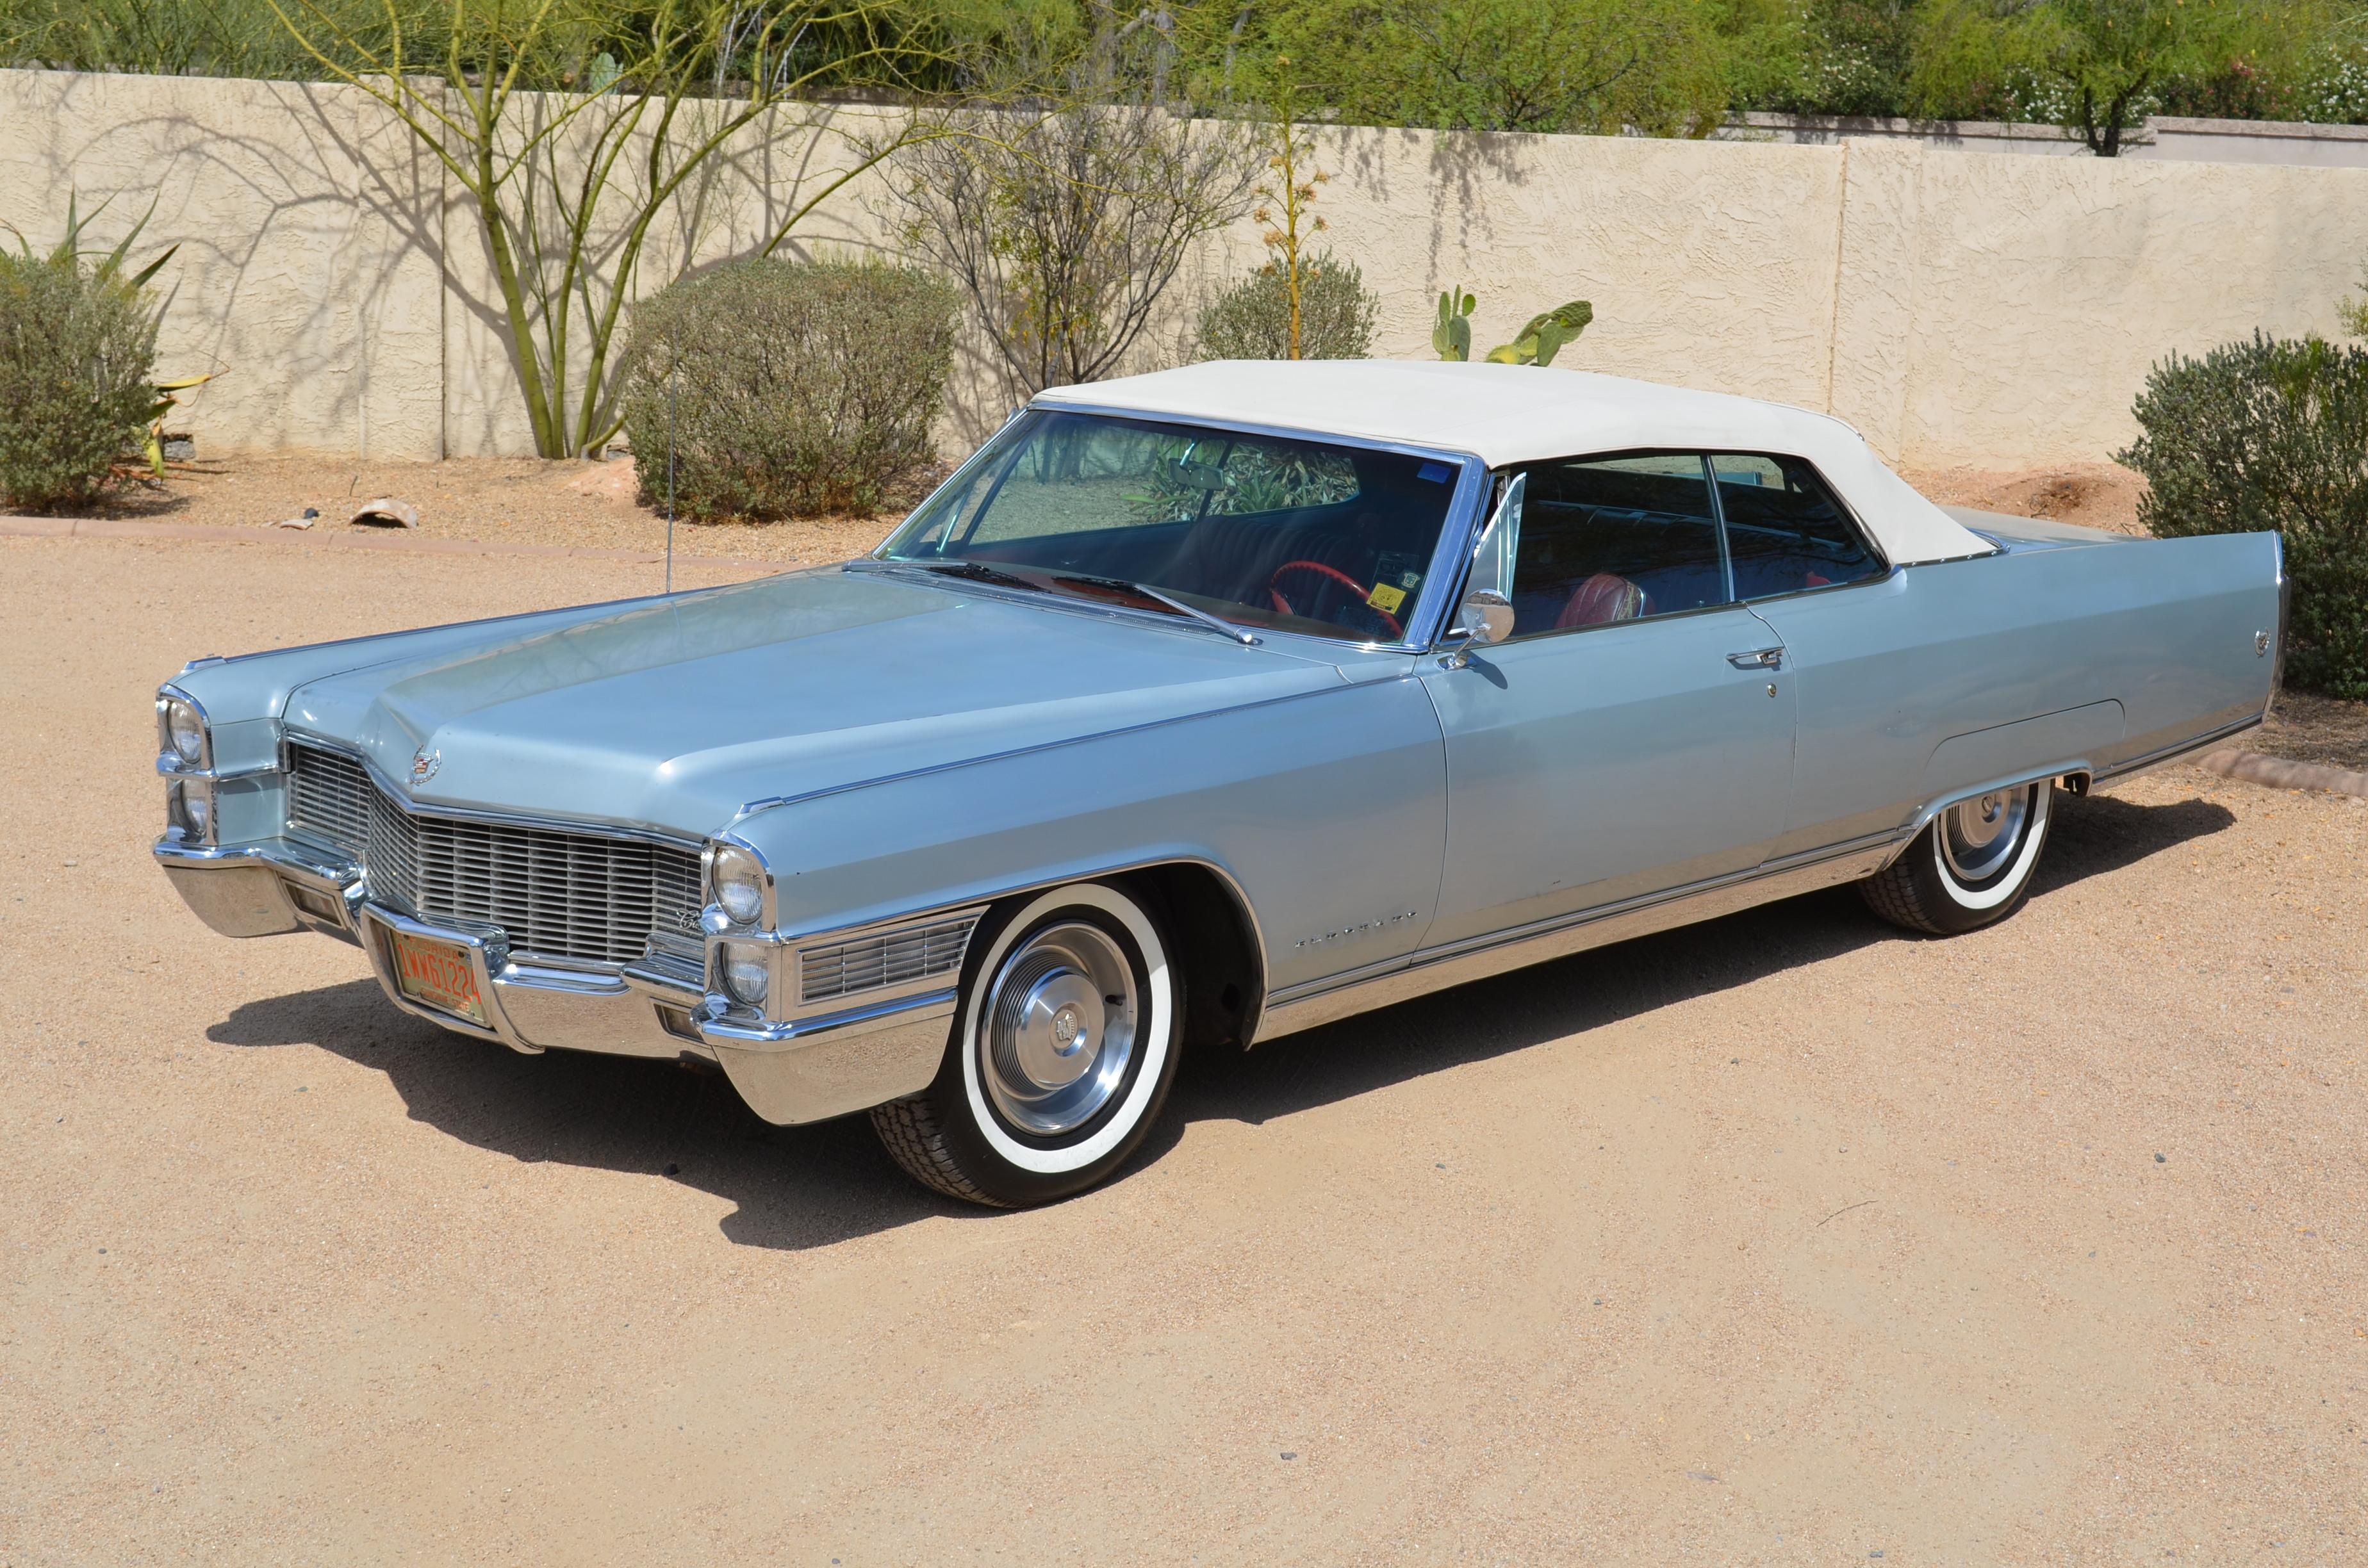 cars i ltd fleetwood silver for sale eldorado arrow convertible cadillac